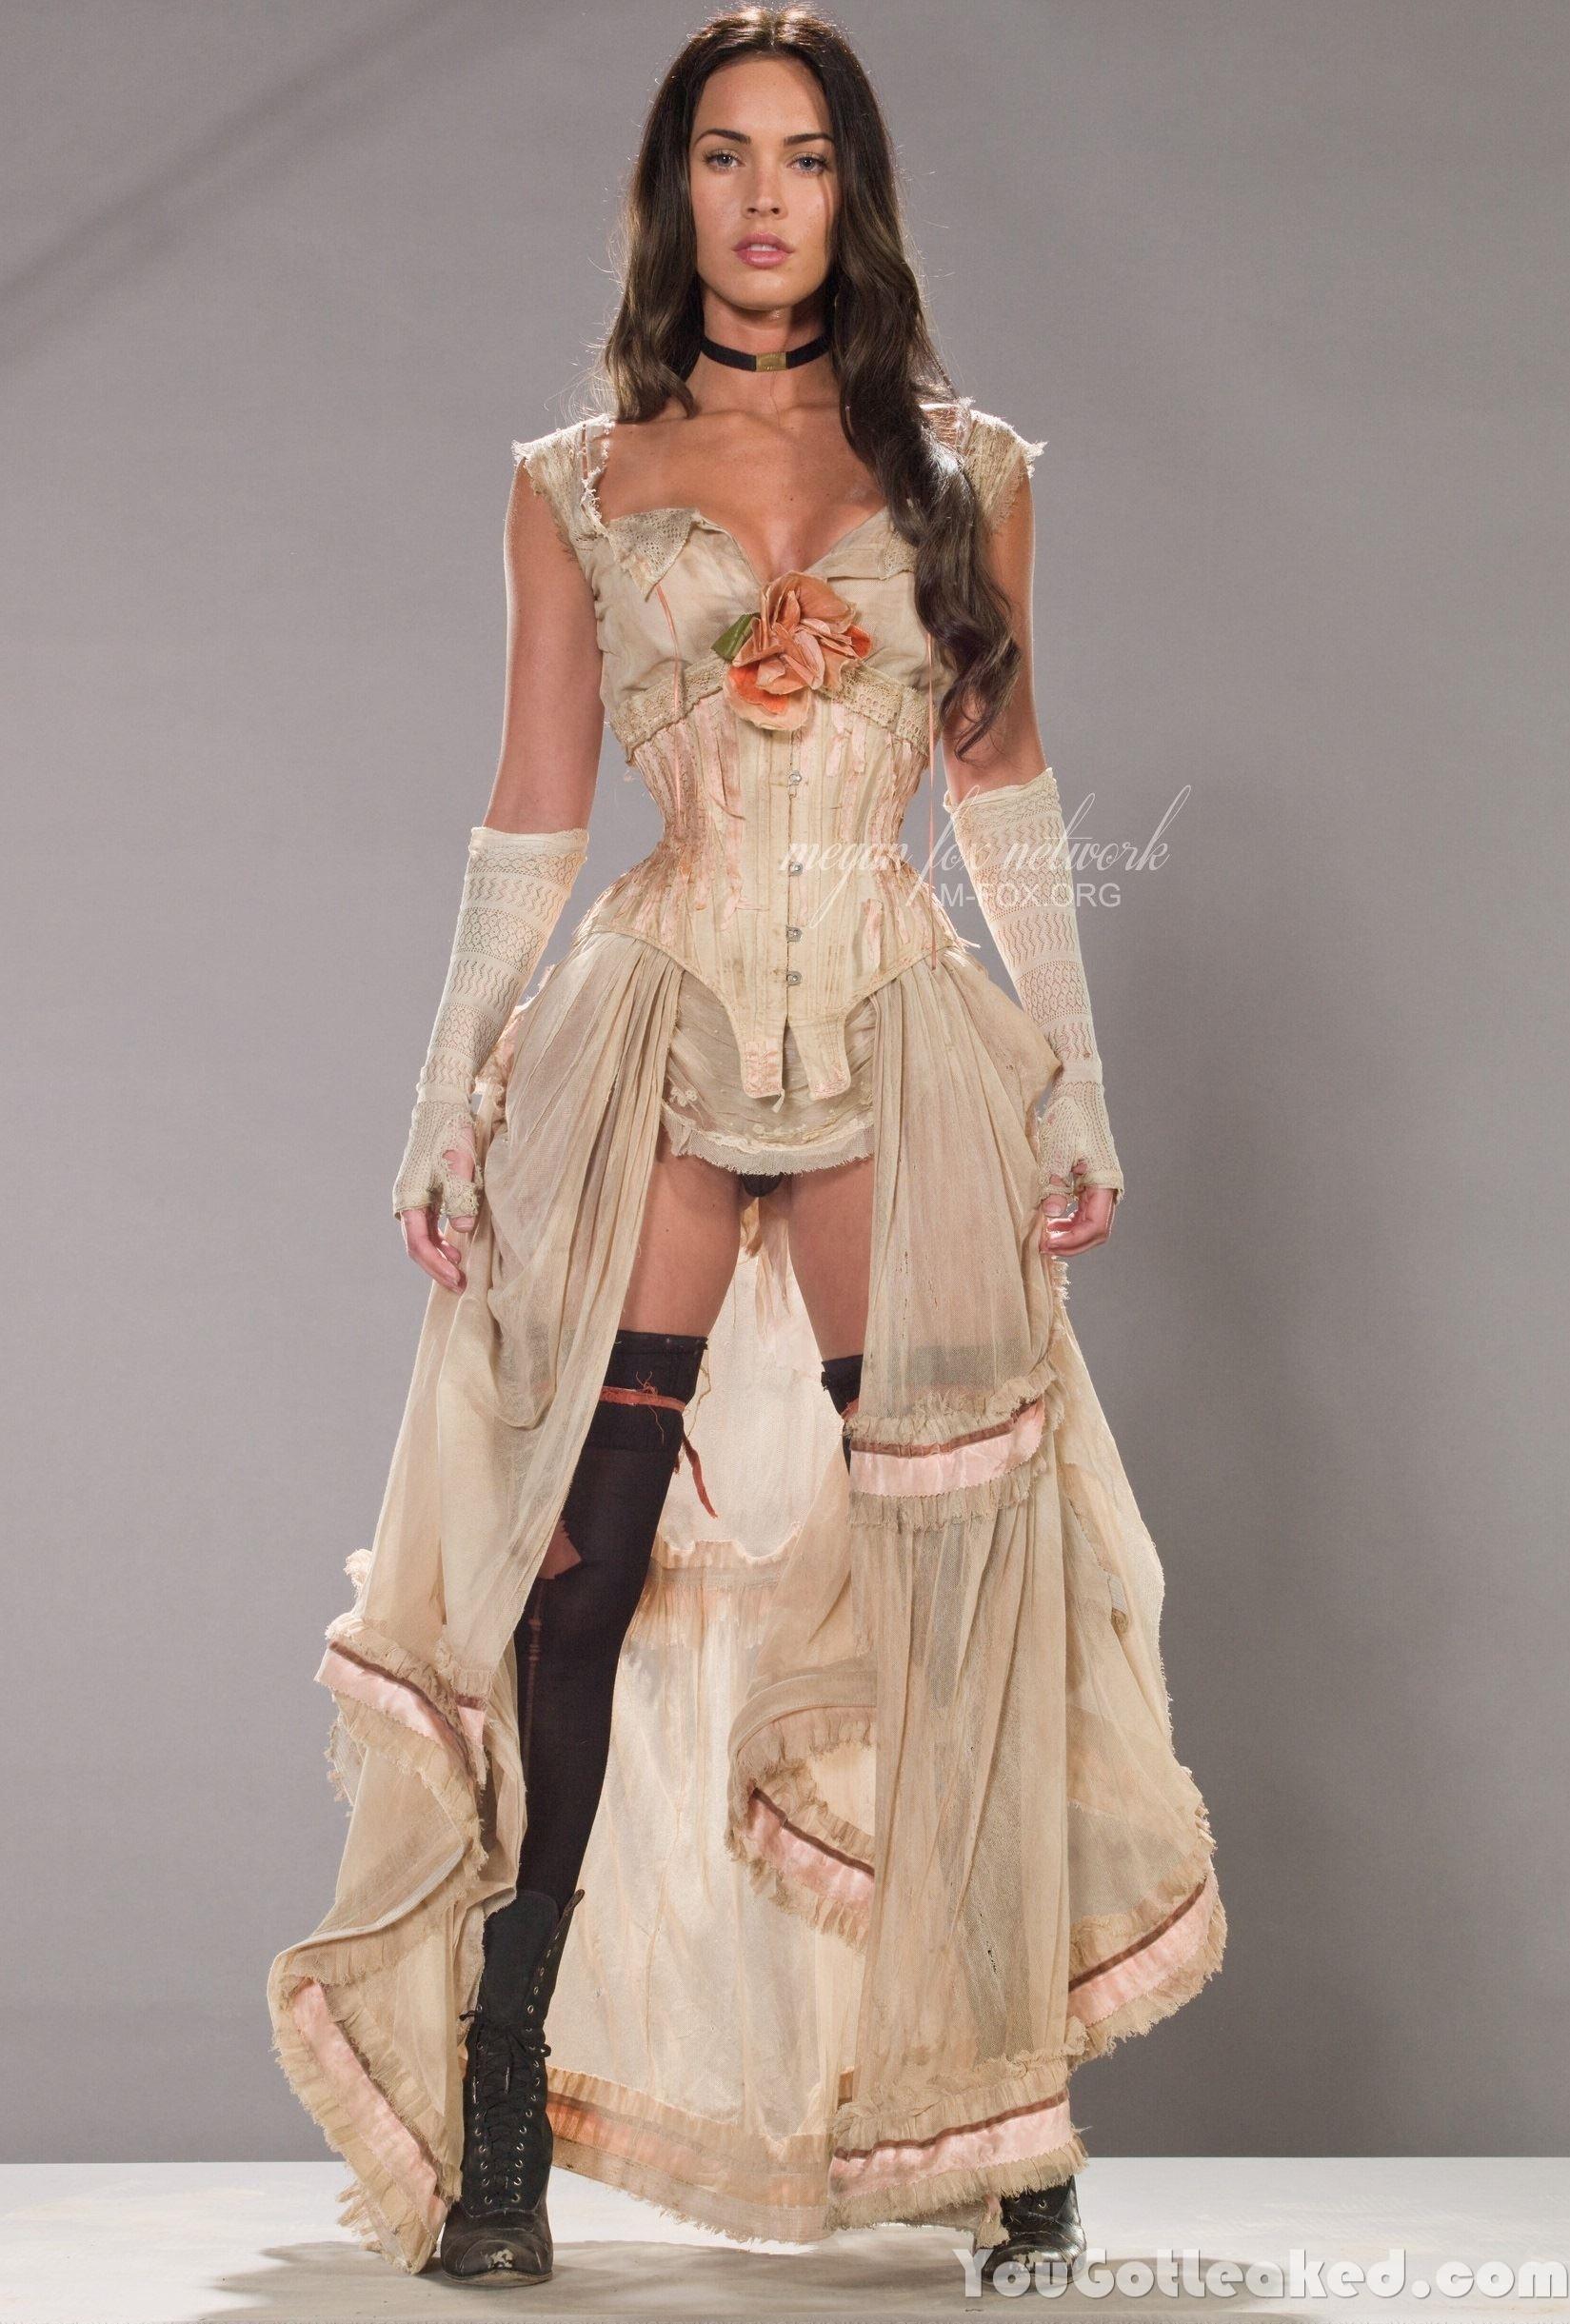 Megan Fox HOT Photoshoot 1